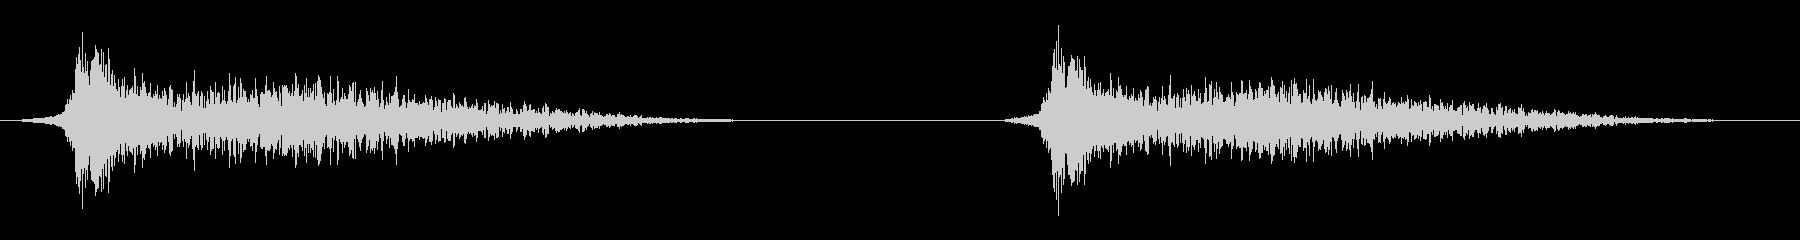 SPACEFIGHTER:2 VI...の未再生の波形